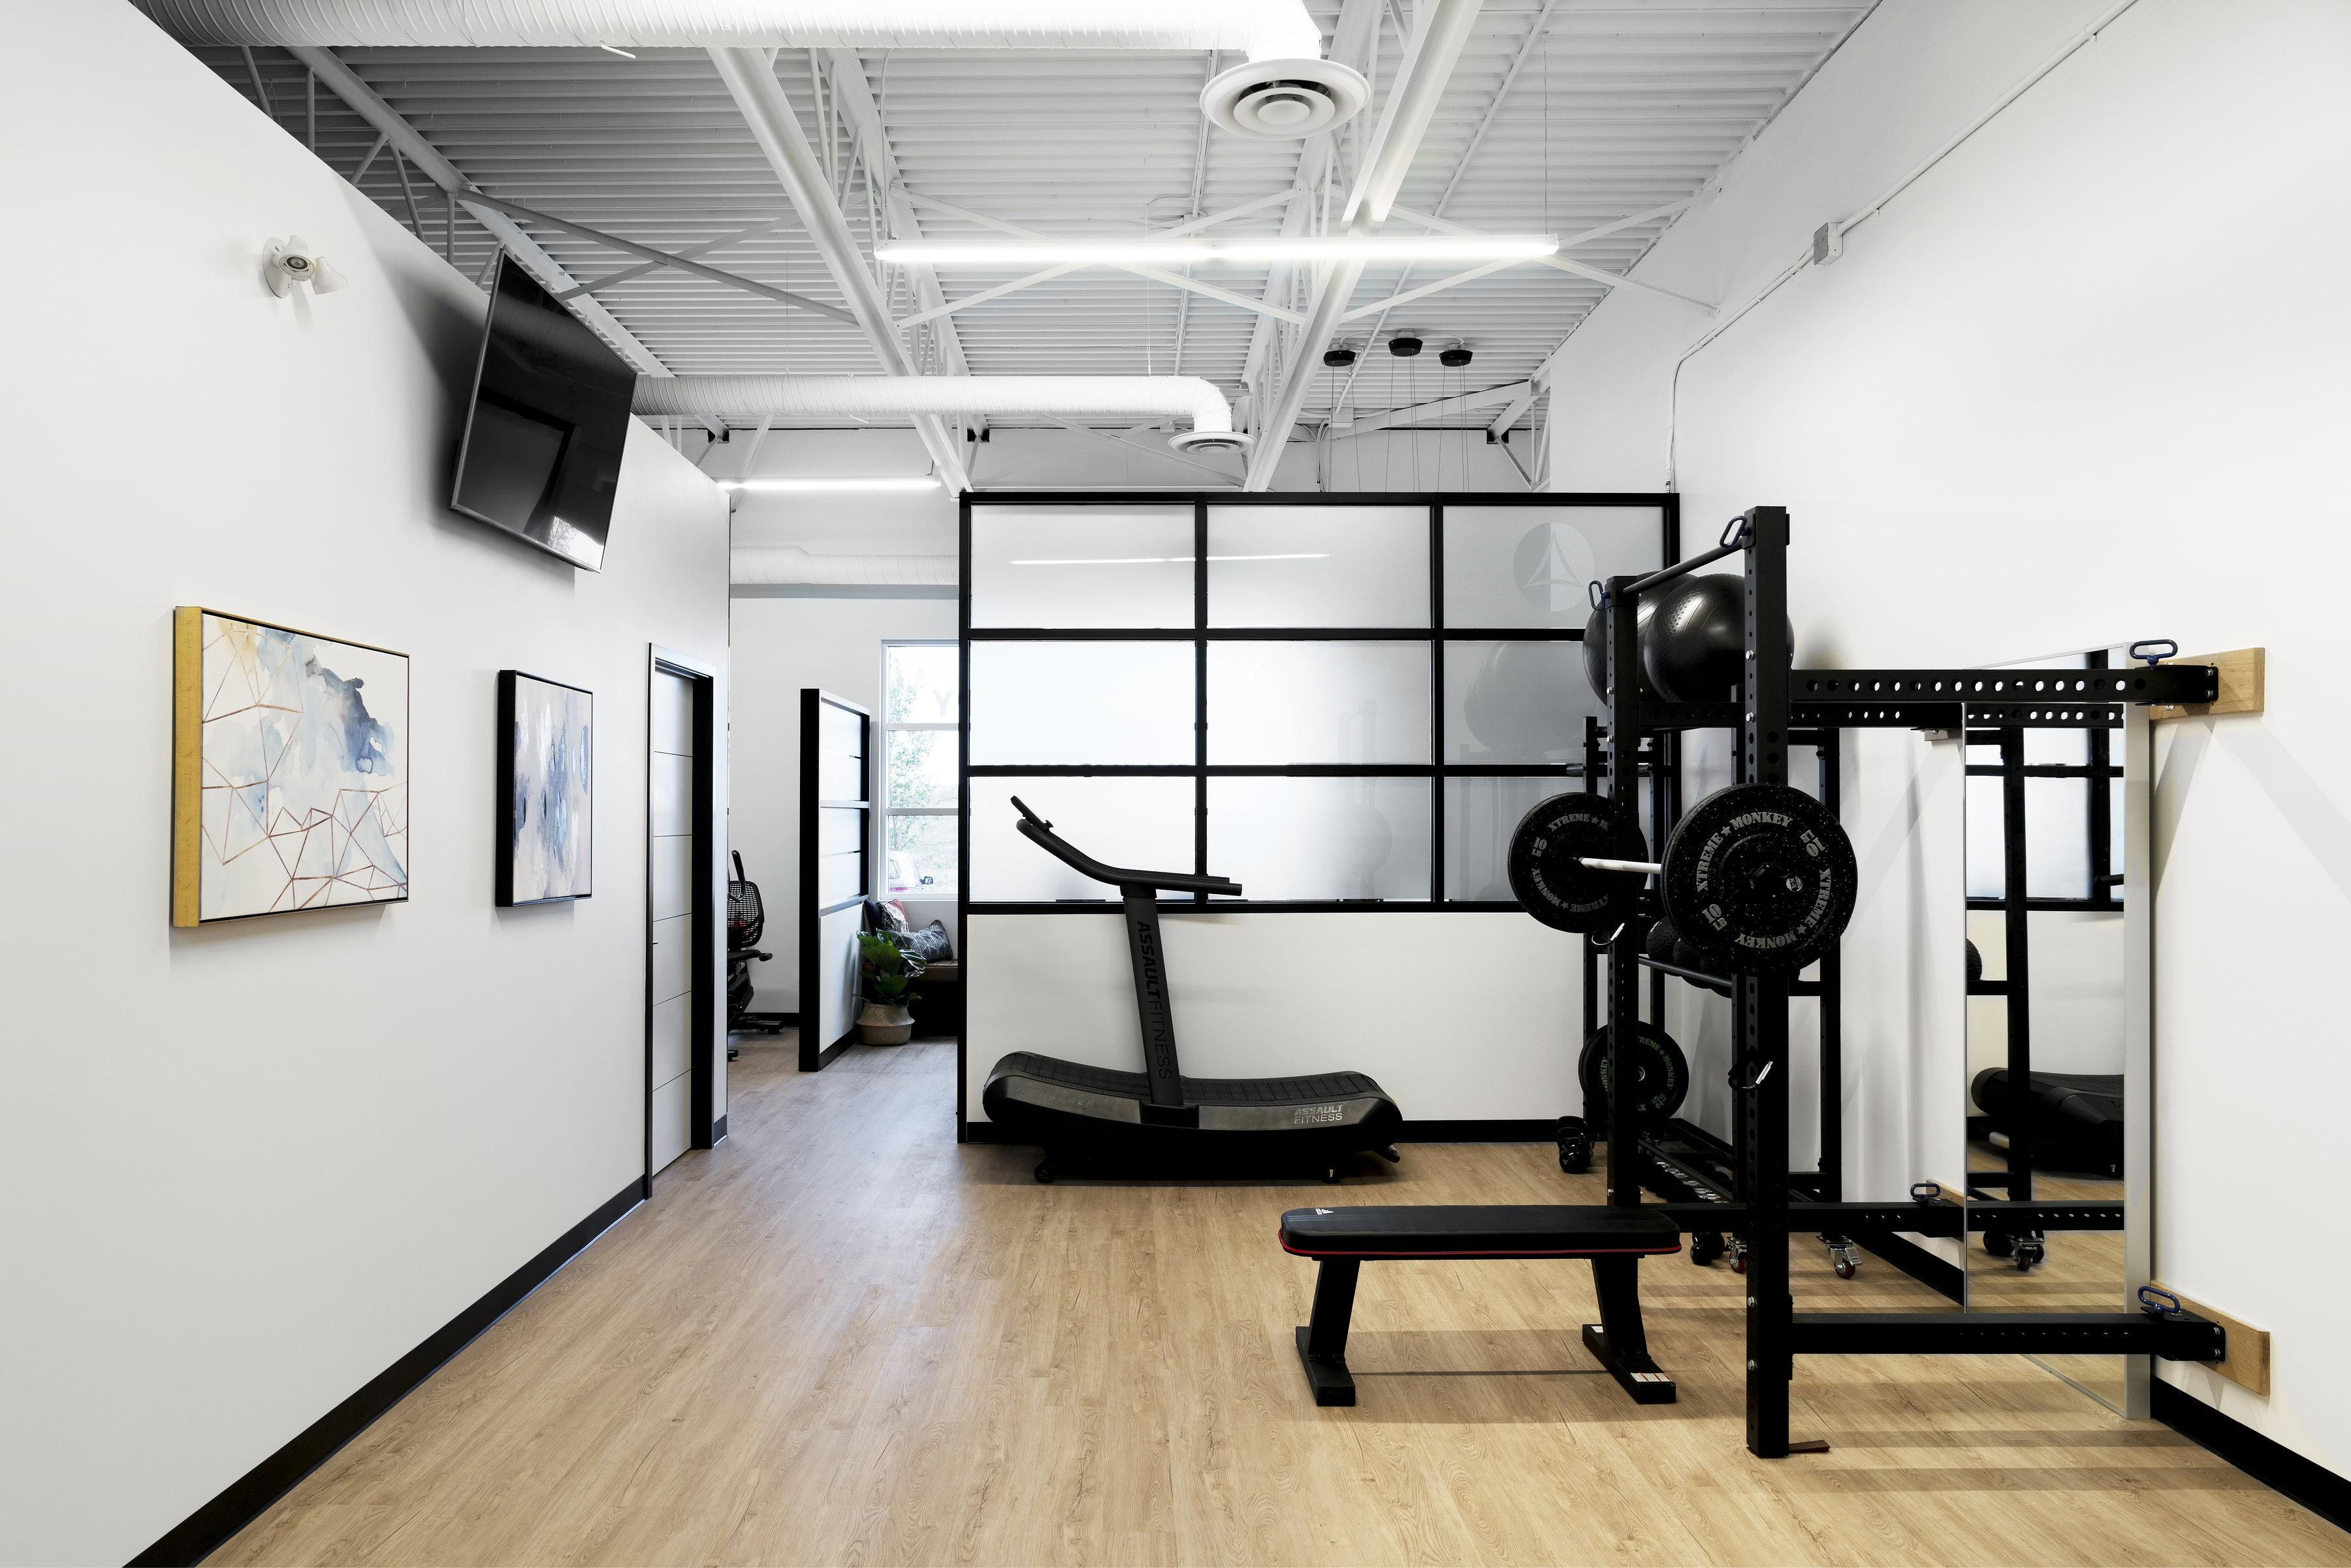 YYC Gym Interior Design